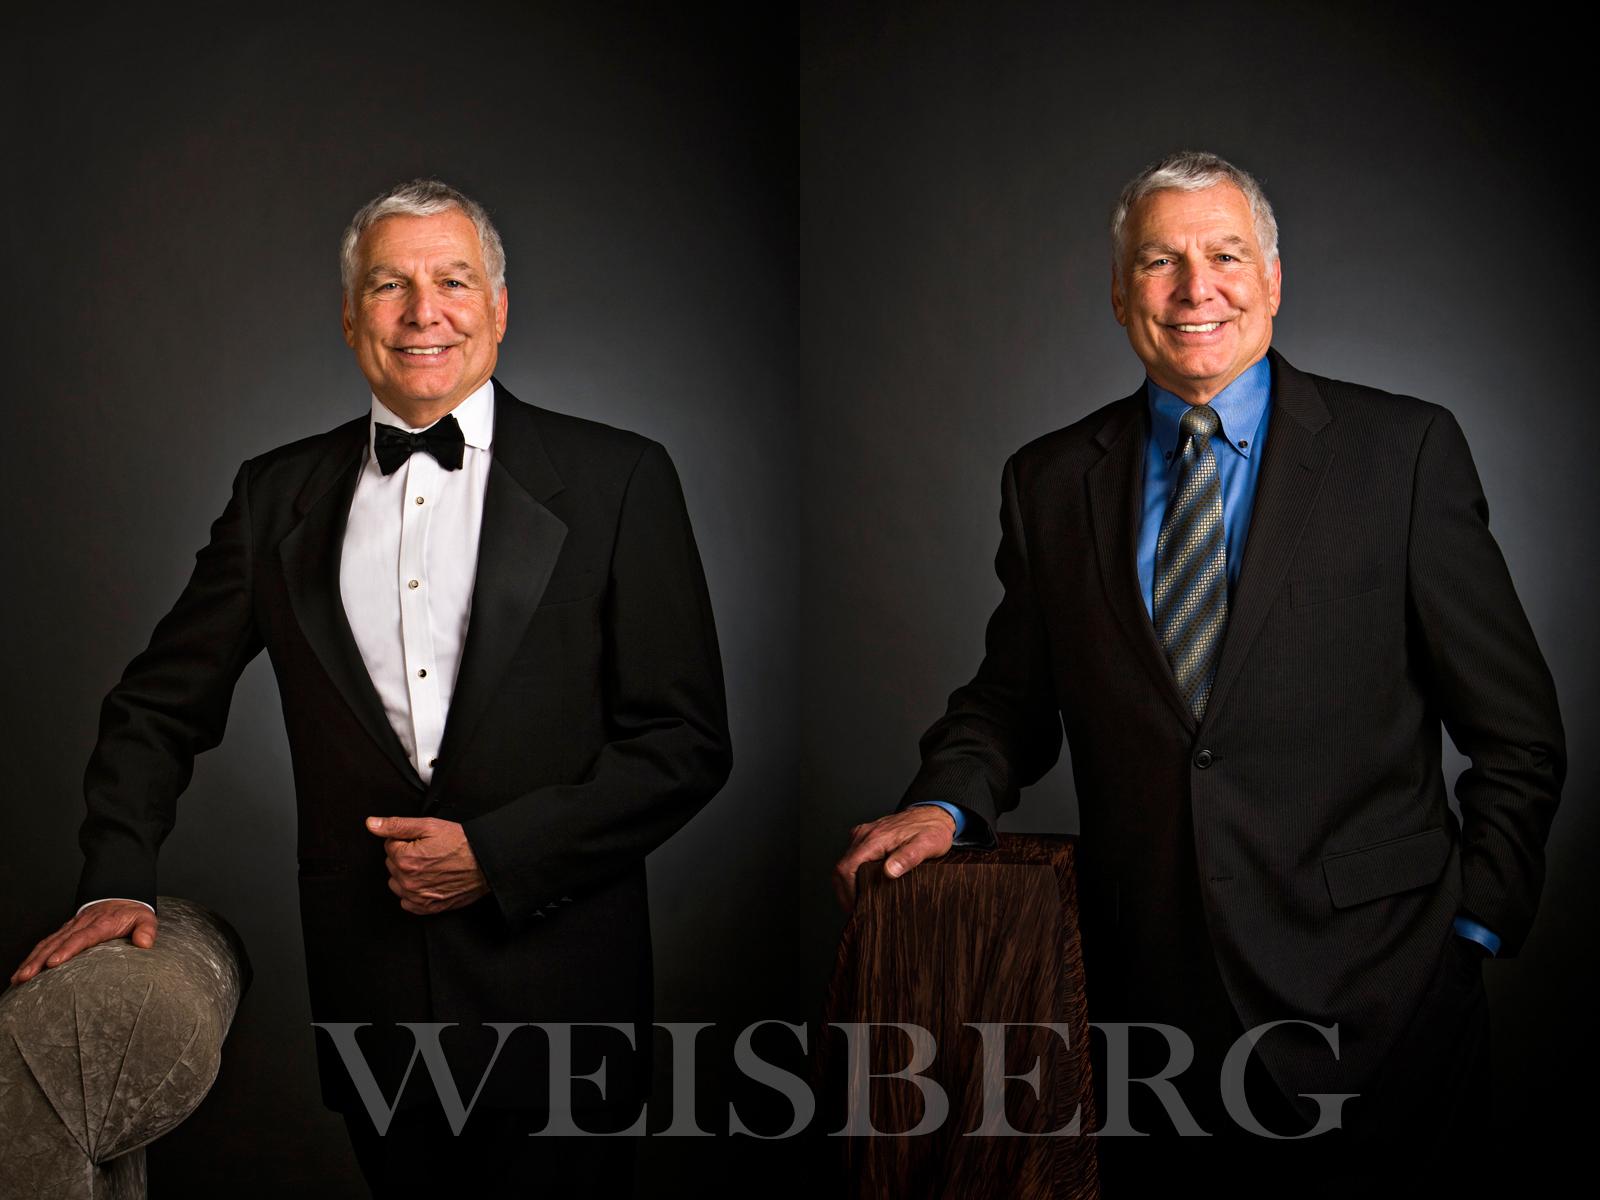 corporate headshots, executive portraits, images for executive portra[